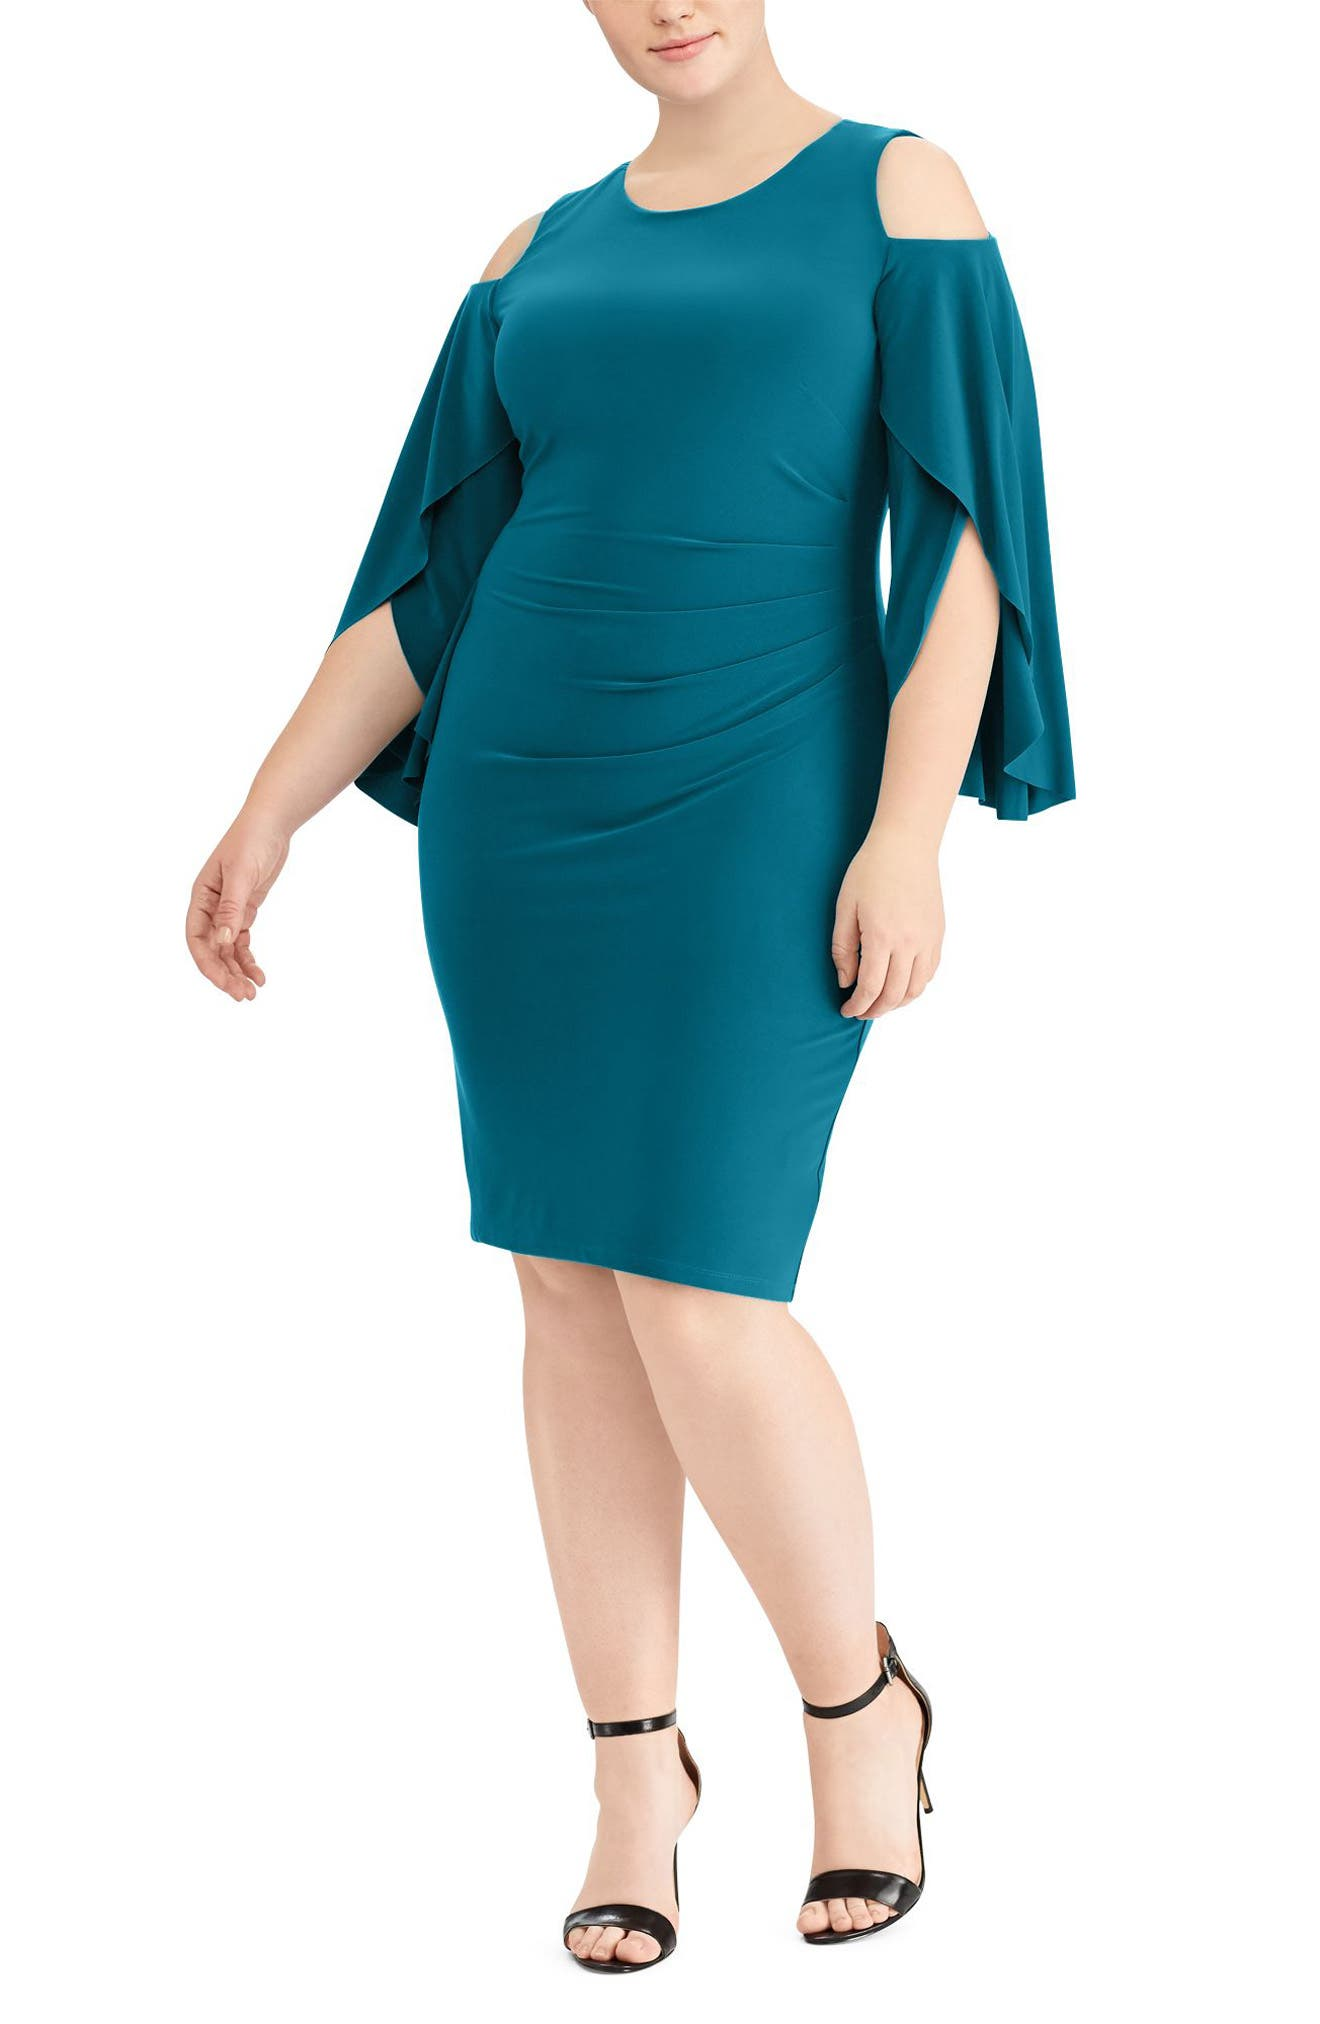 Debbie Cold-Shoulder Dress,                             Main thumbnail 1, color,                             French Teal